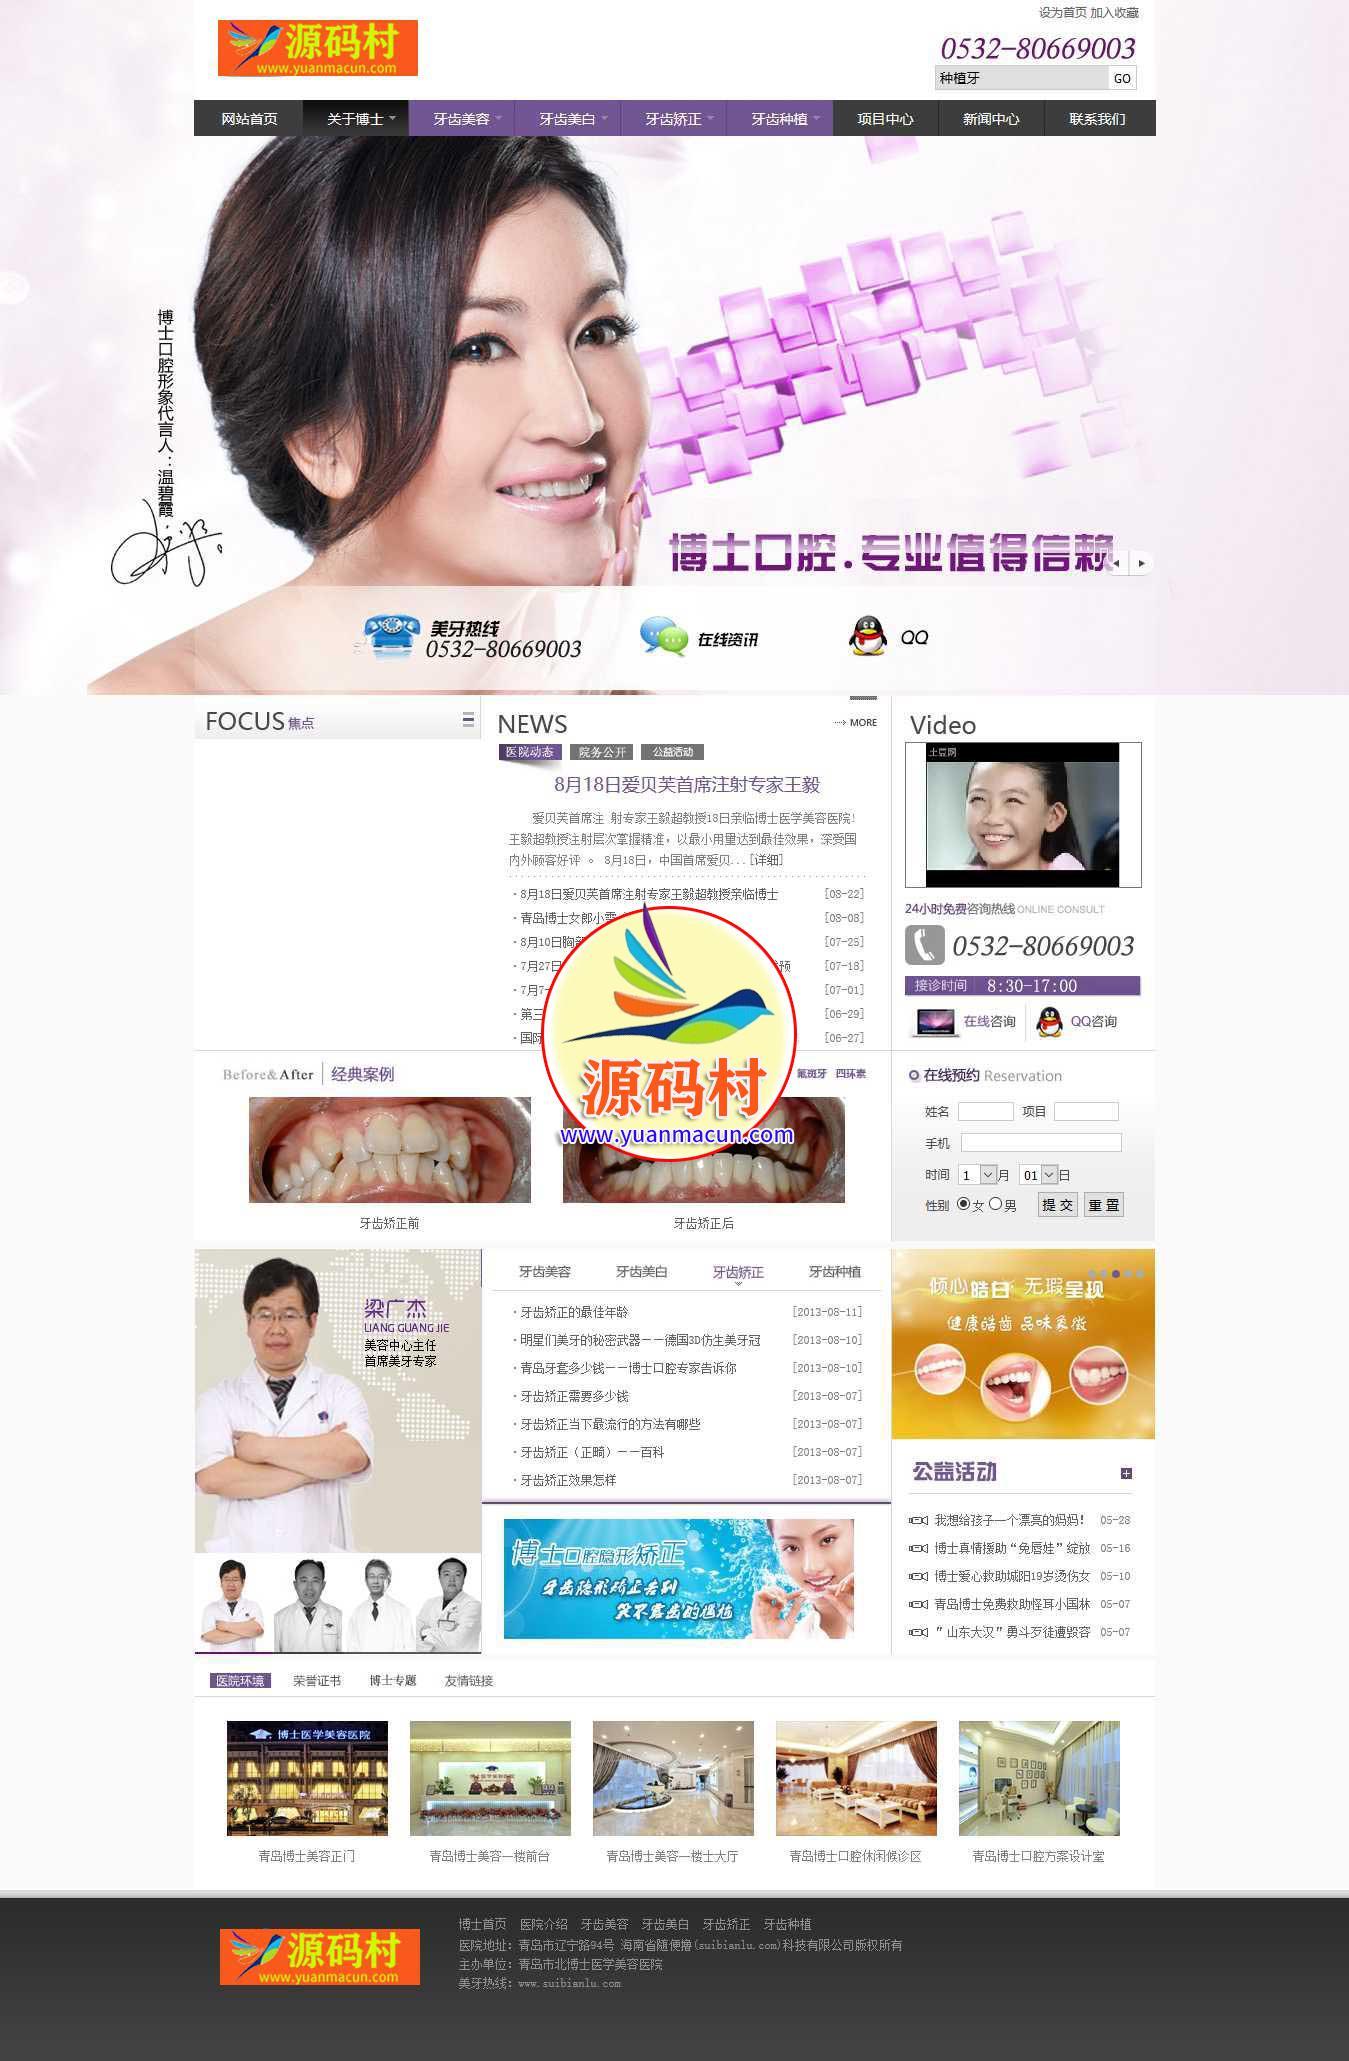 DEDE5.5,医院医疗口腔医学美容中心类企业网站通用织梦模板